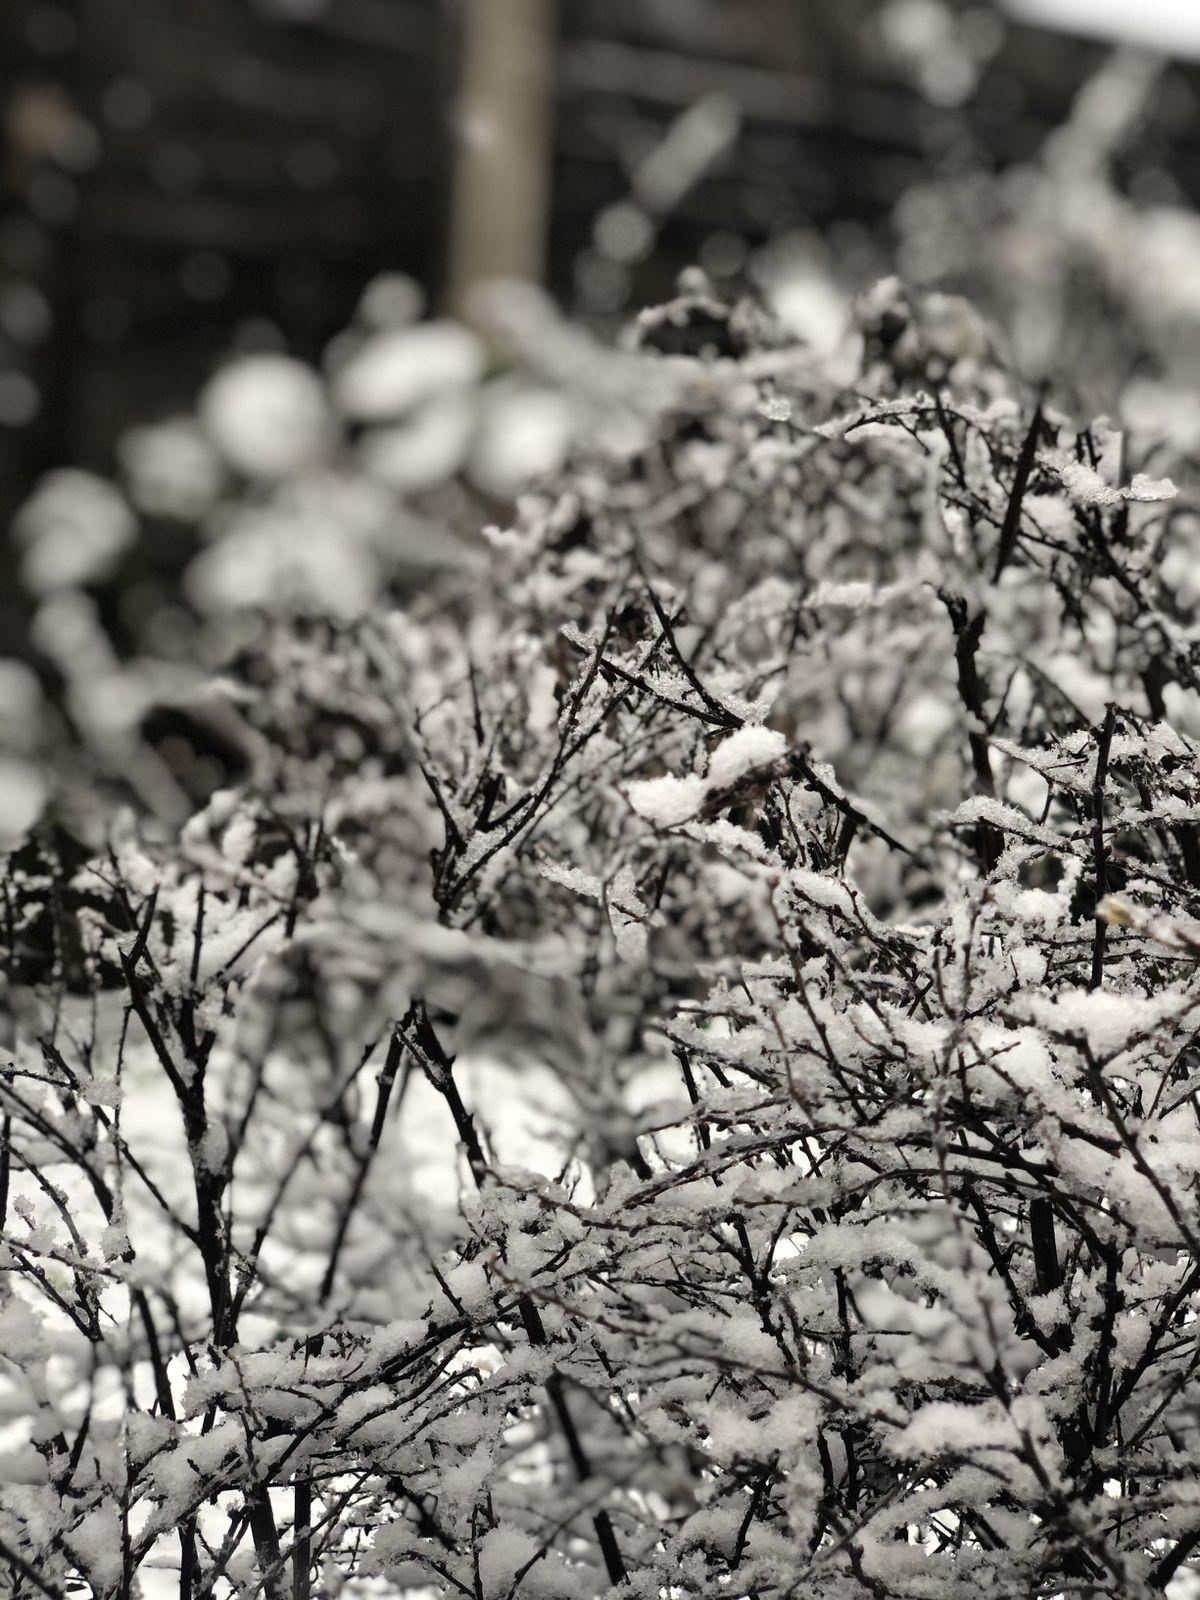 Snow in Pelsall, Walsall, by Jade Patten